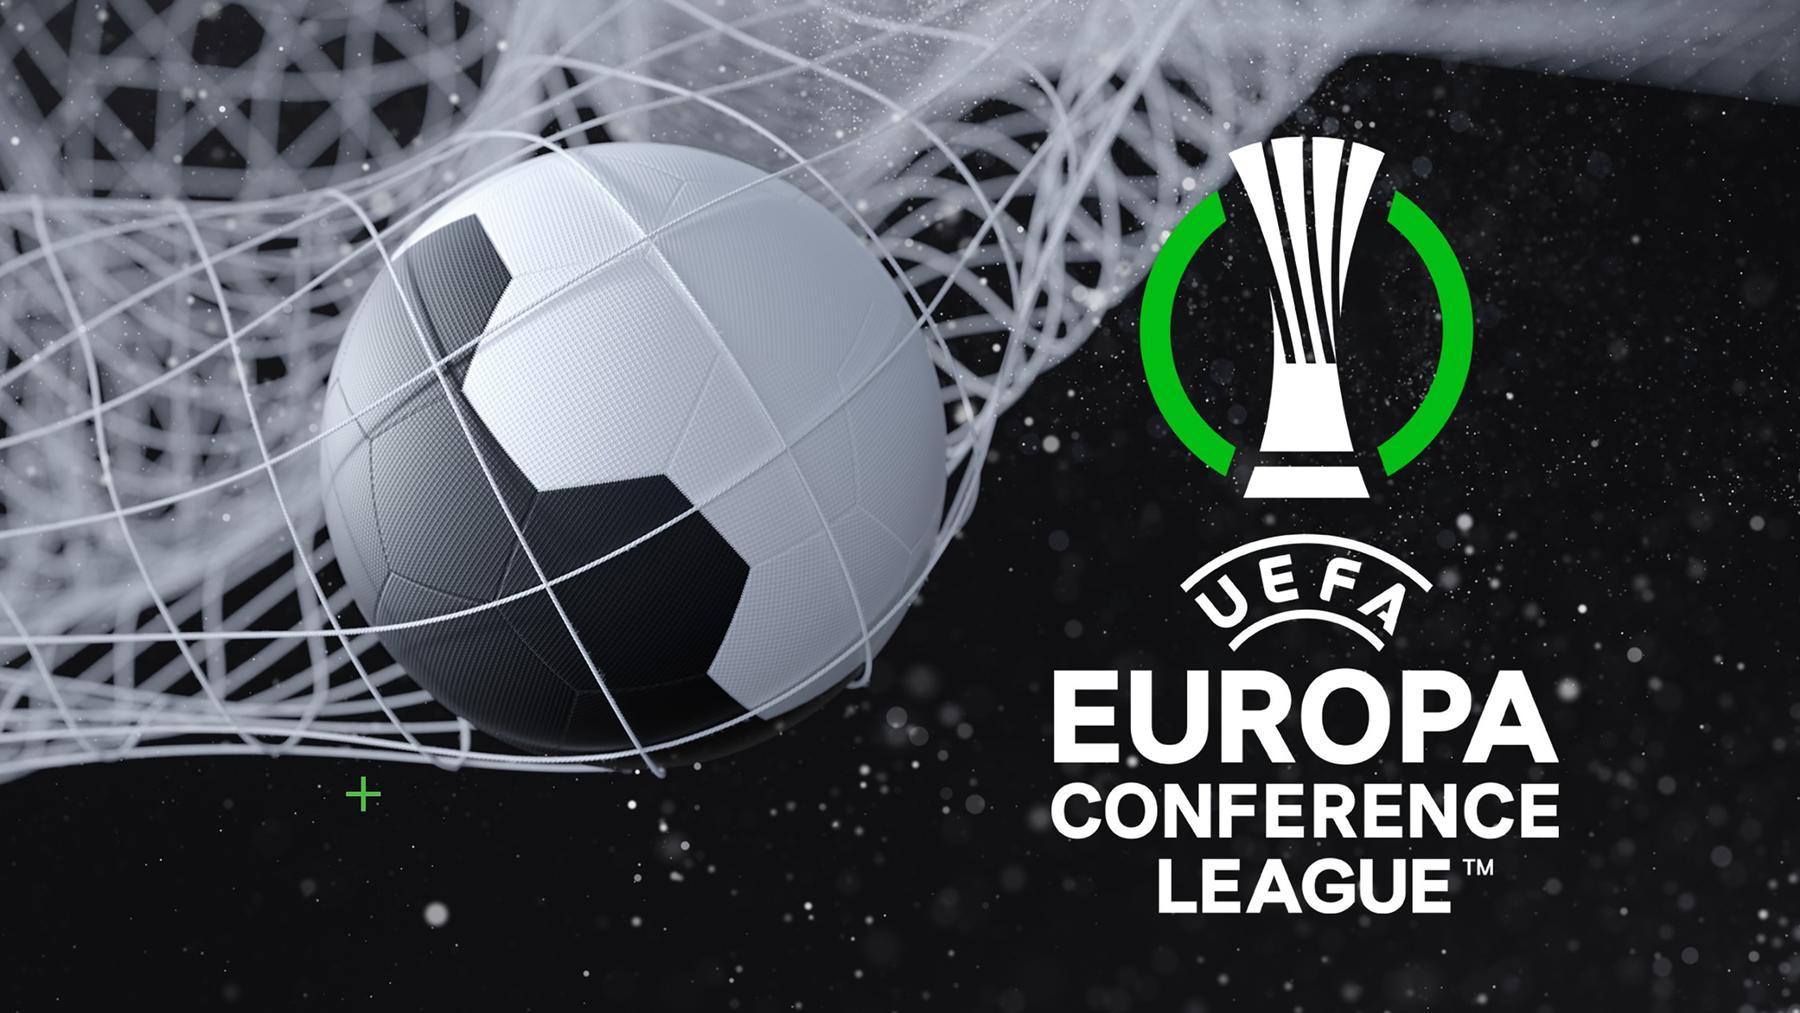 UEFA Europa Conference League: Highlights